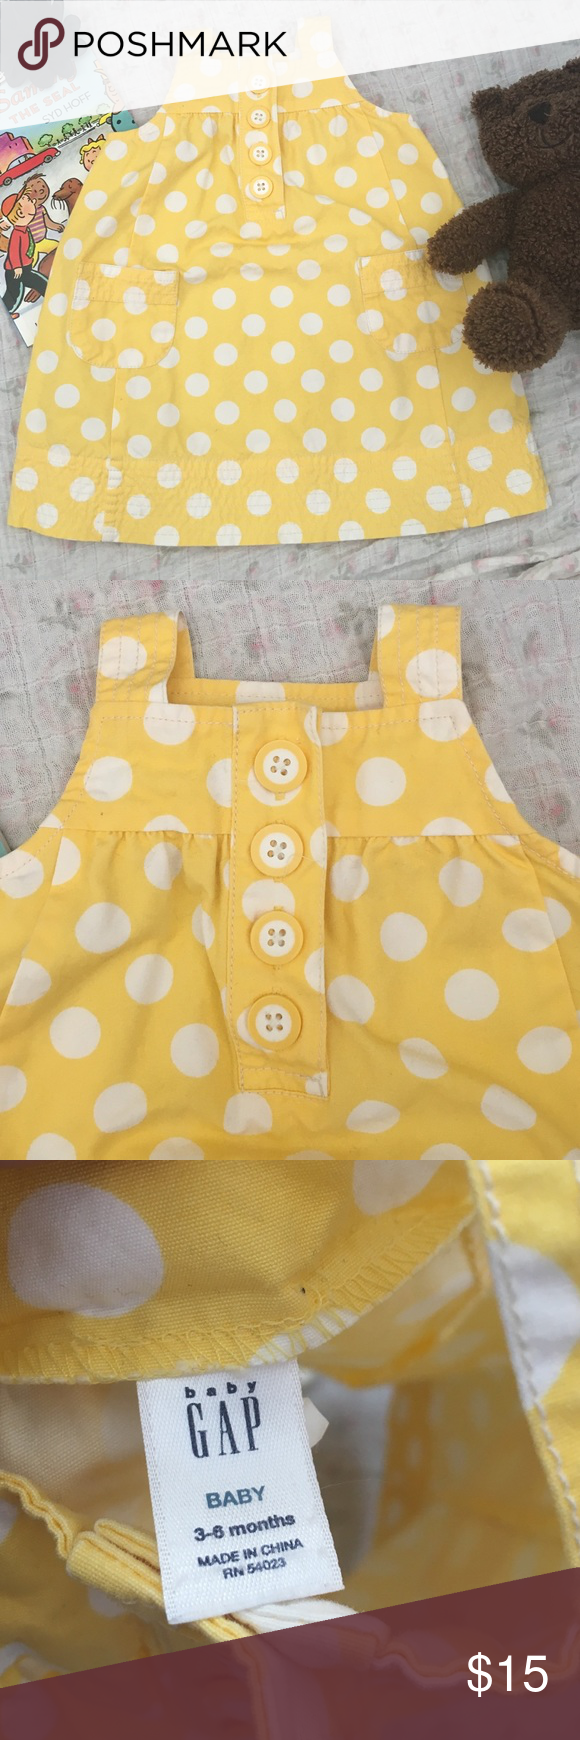 Yellow dress 3-6 months  Baby GAP yellow dress